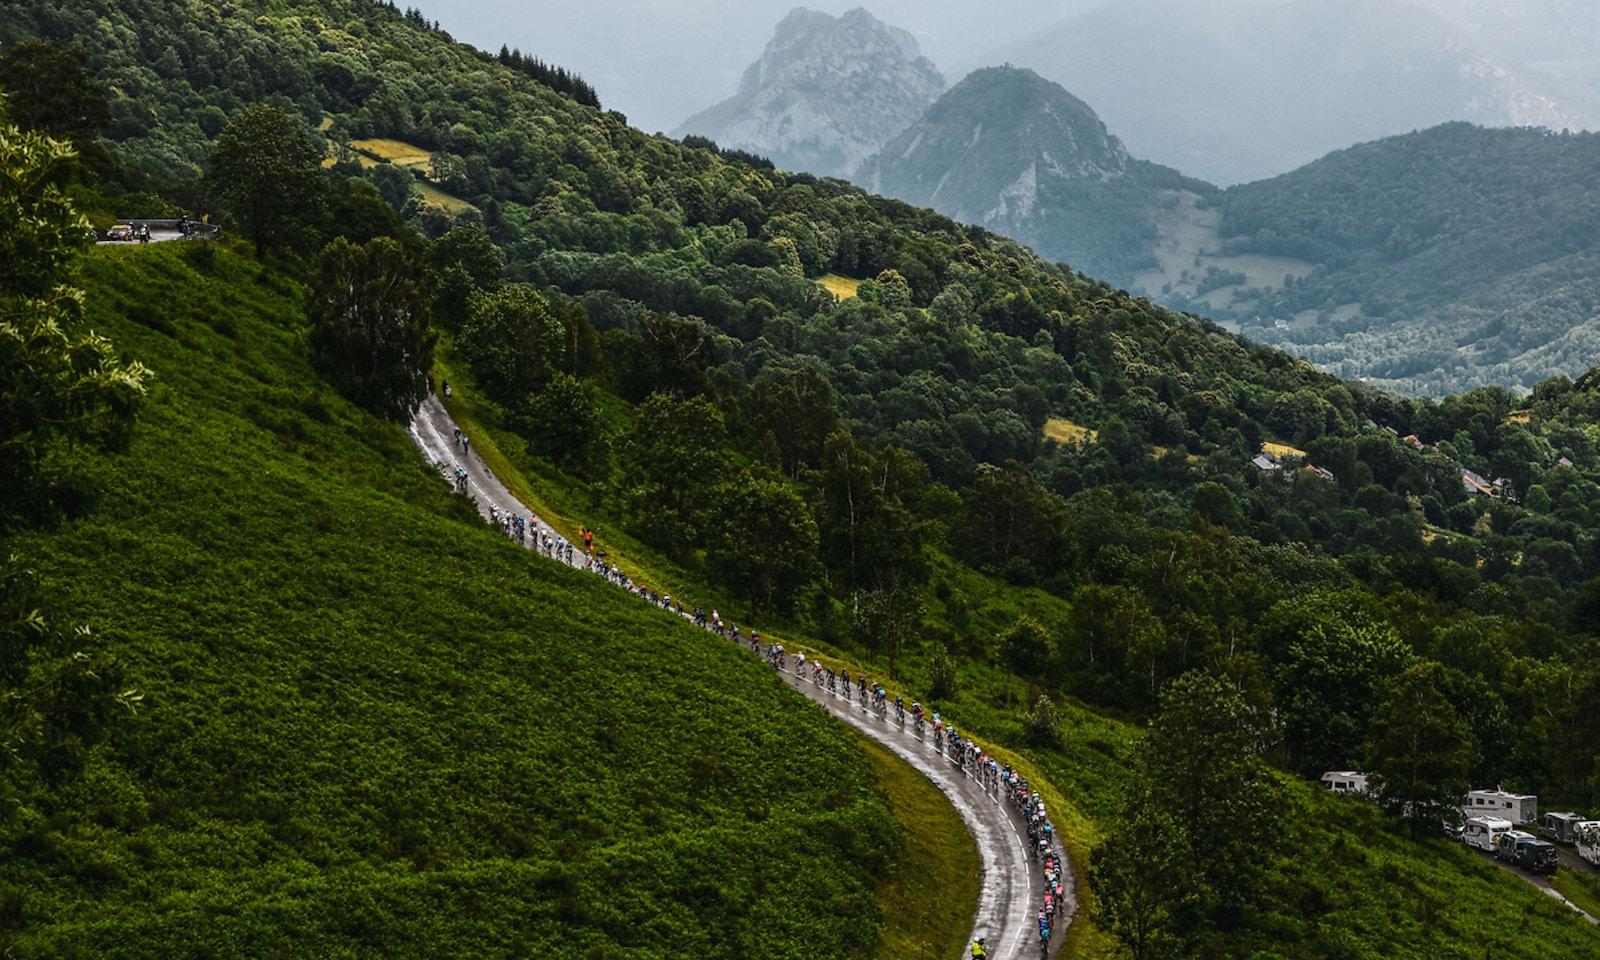 Tour de France 2021: Zusammenfassung der sechzehnten Etappe